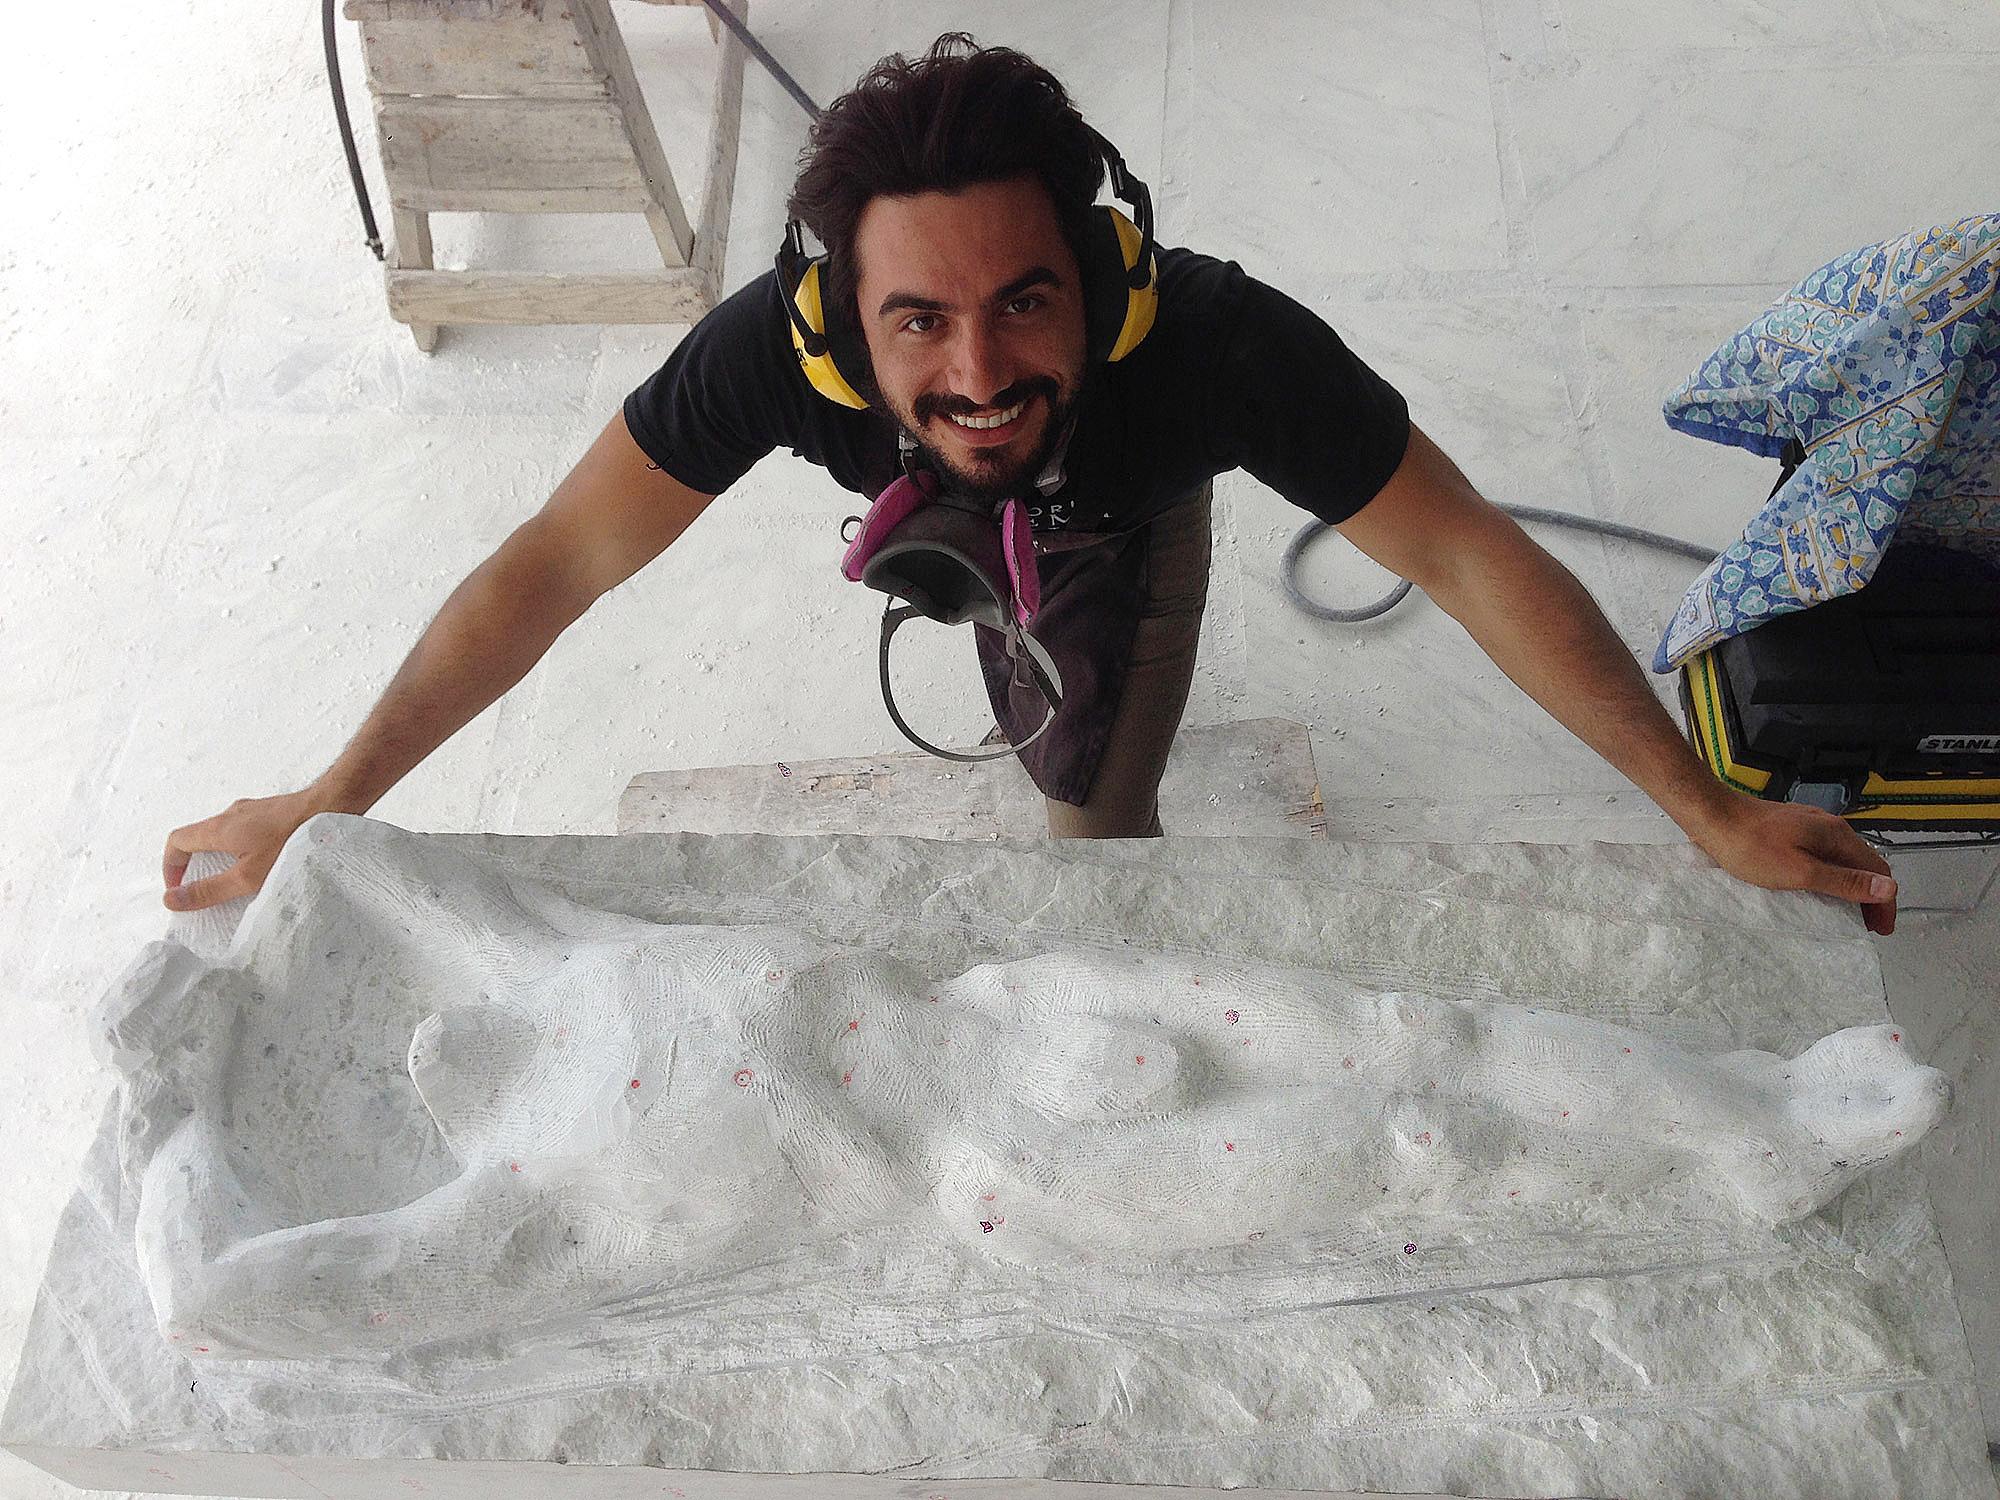 New-York-Academy-of-Art-Carrara-Residency-Josh-Henderson-Marco-Palli20171213_0156.jpg